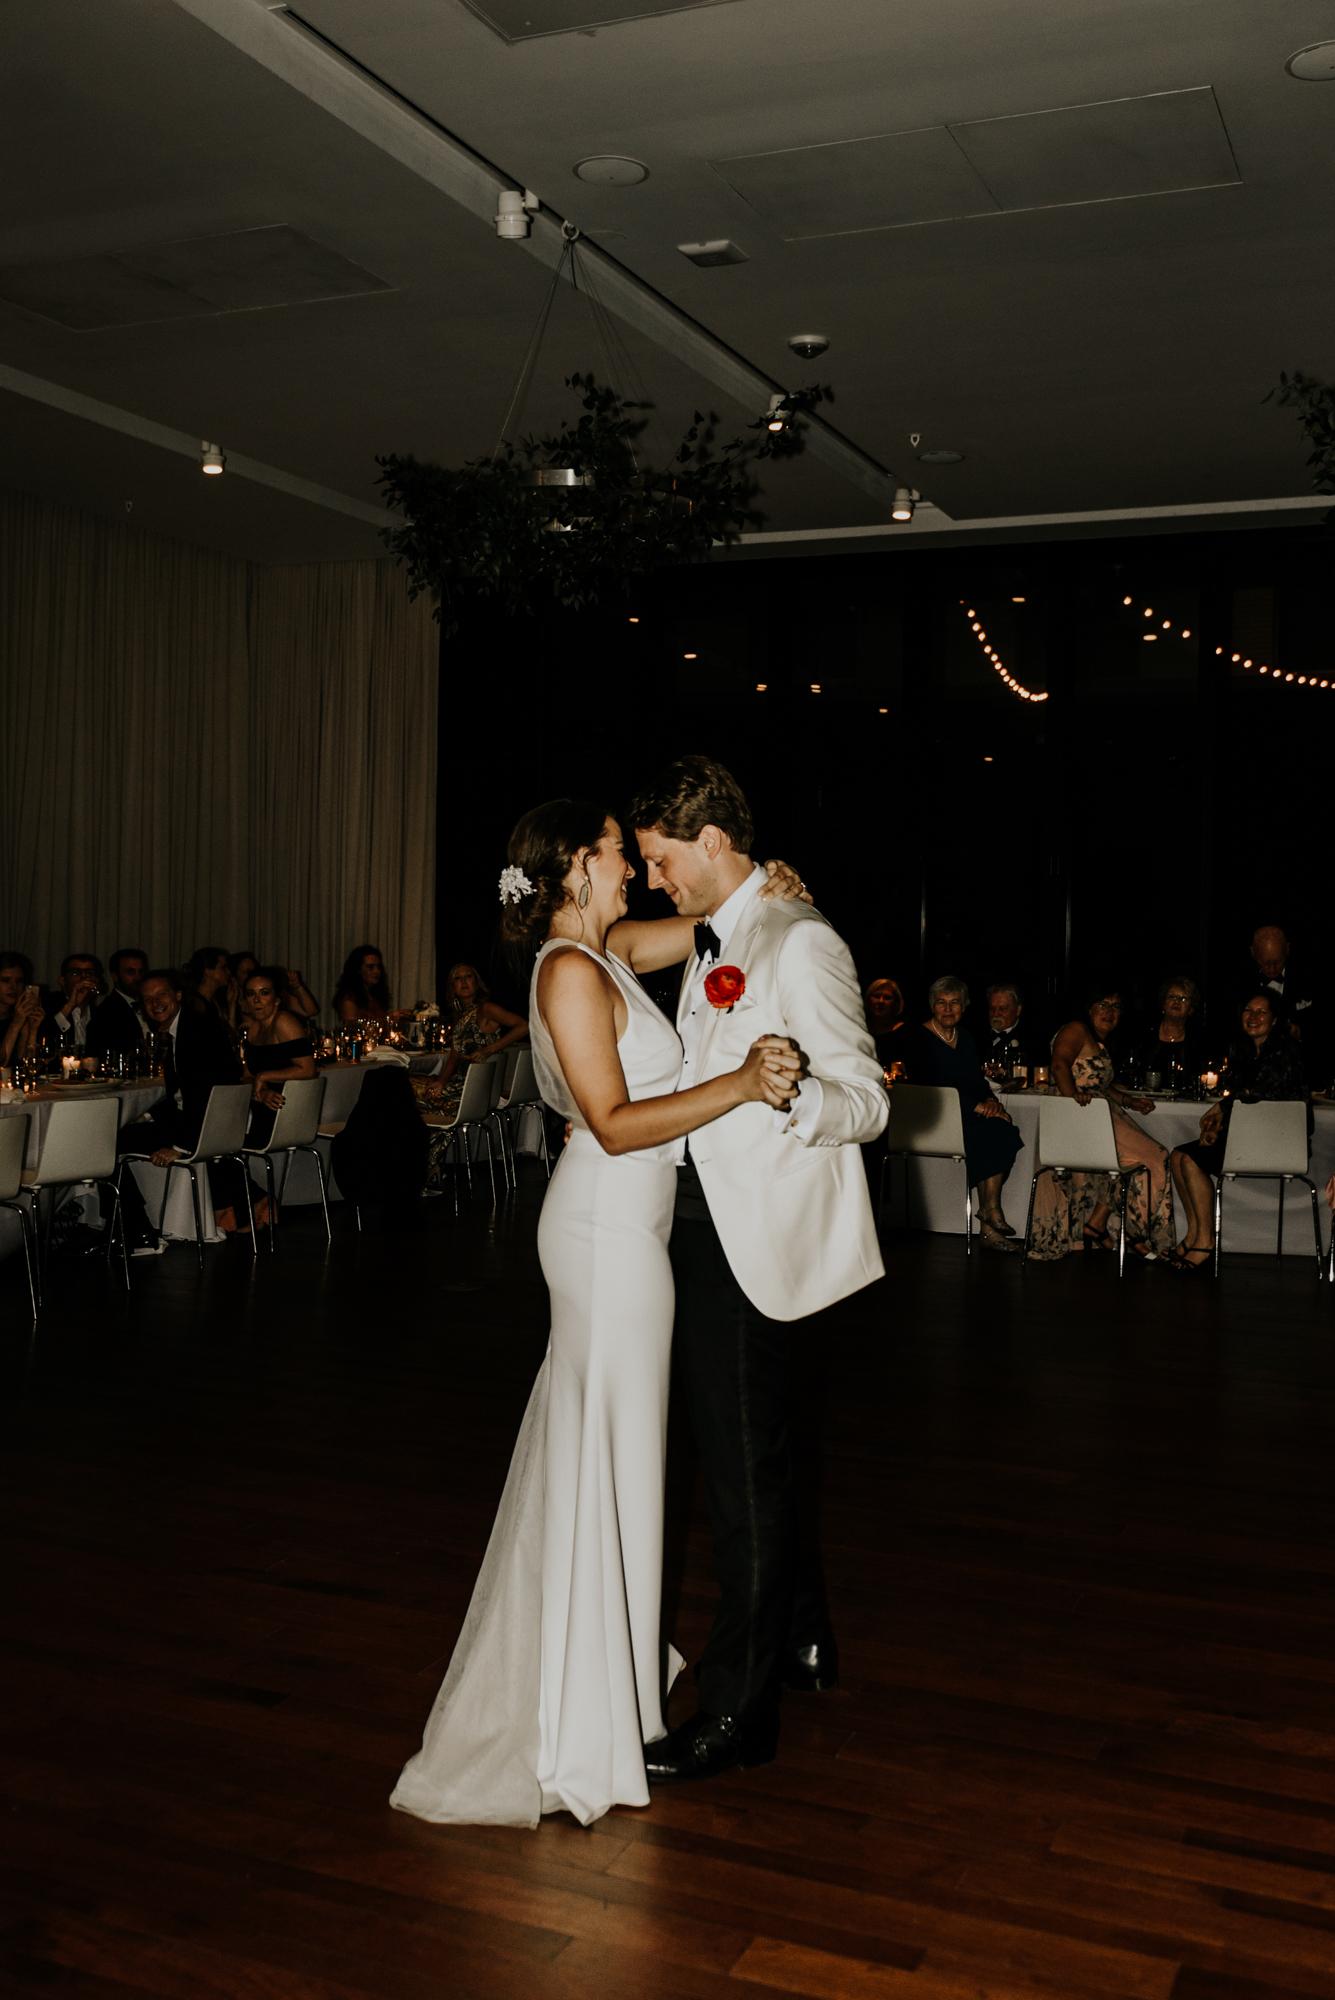 South Congress Hotel Wedding First Dance Photos Austin, Texas